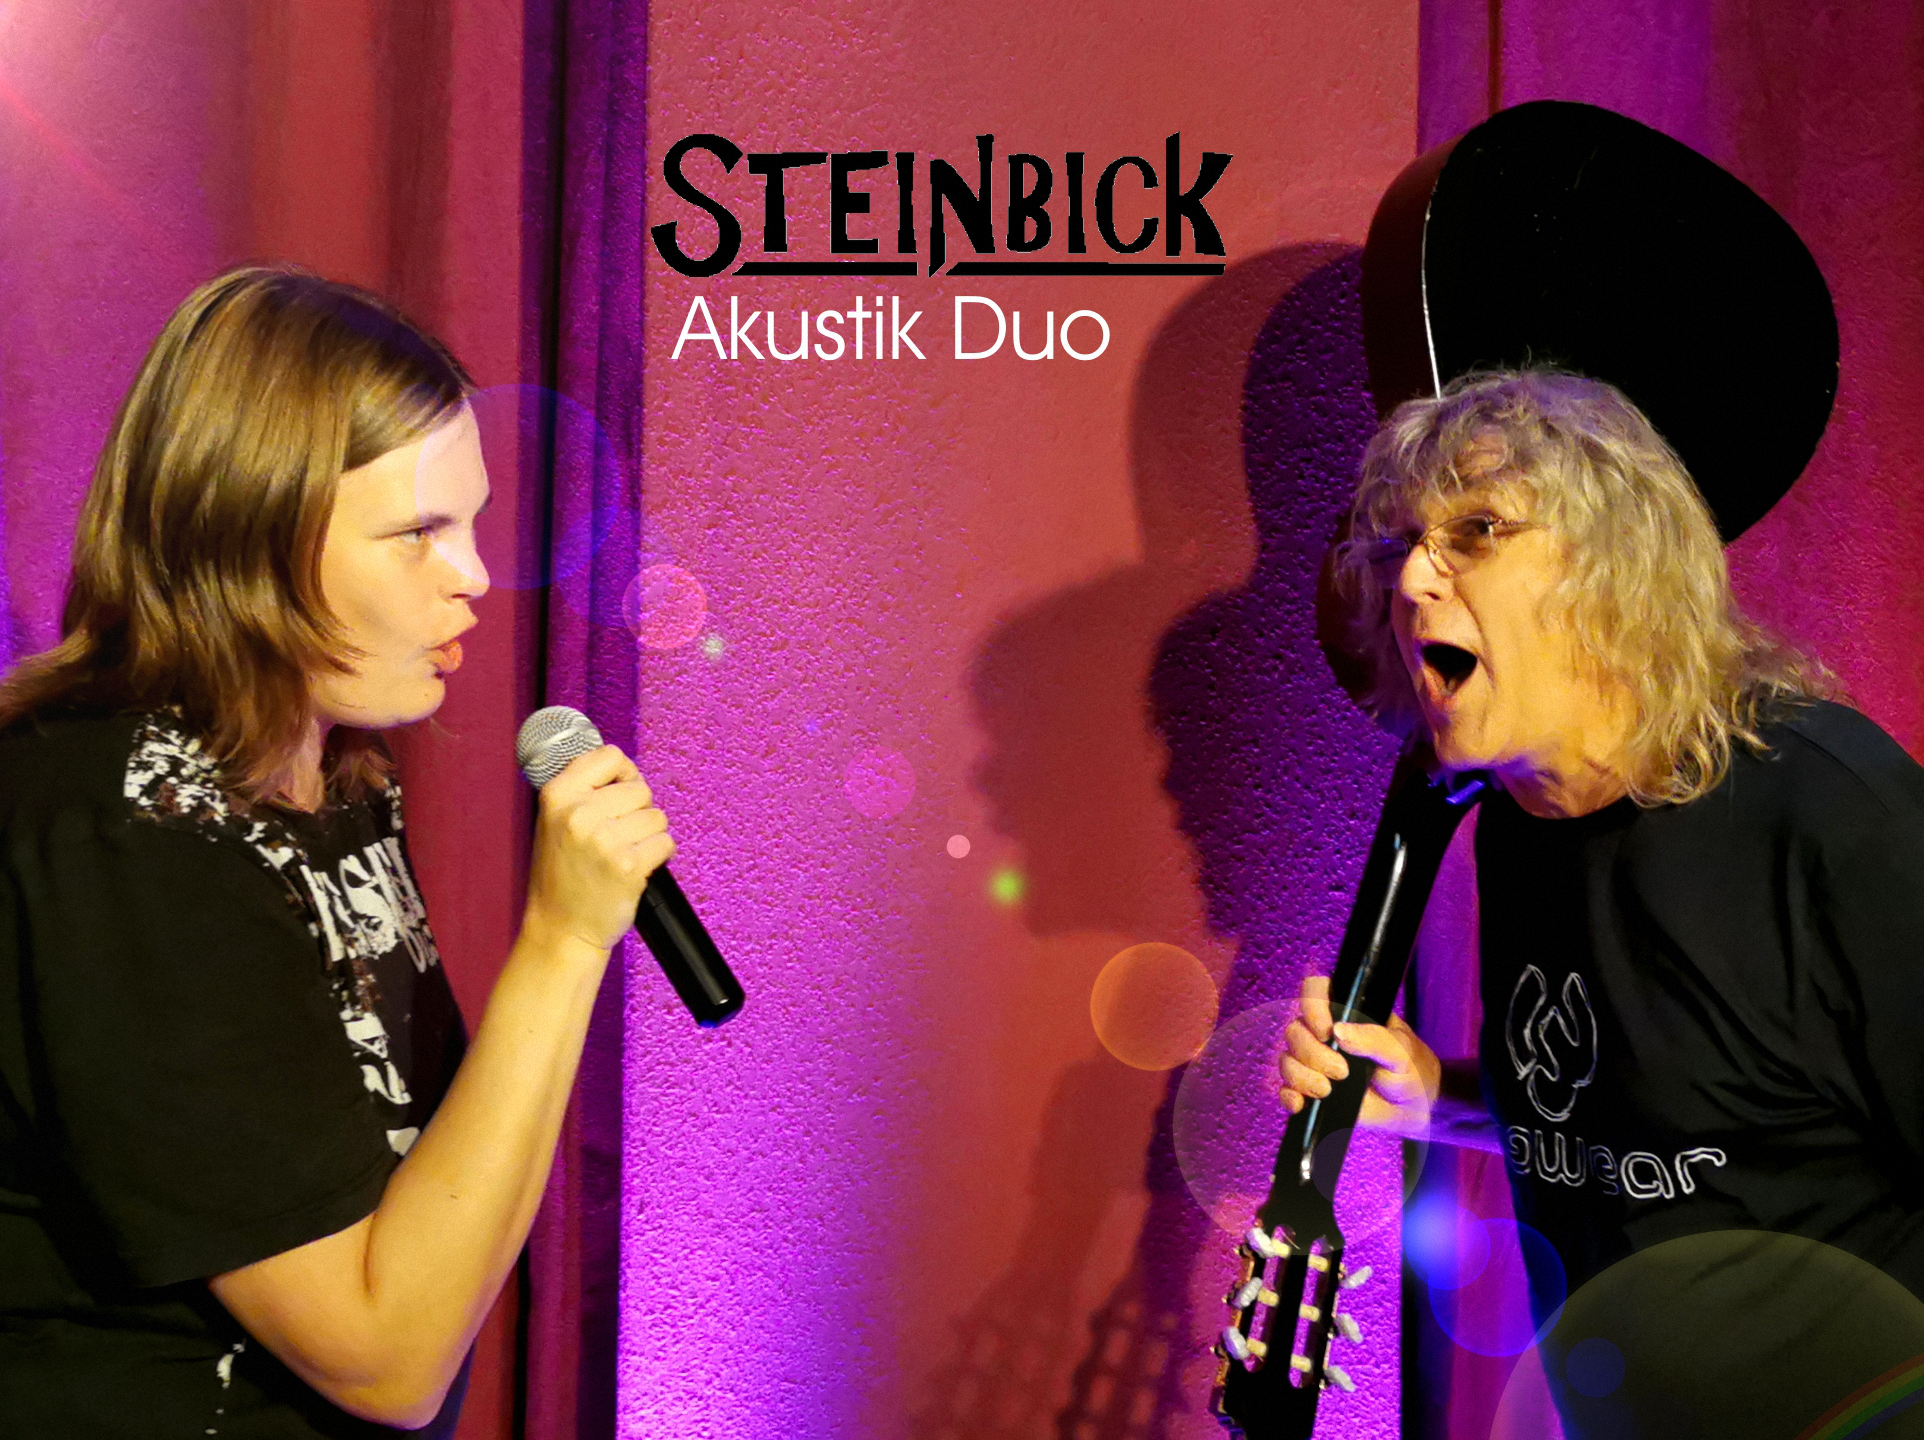 Steinbick Pressefoto